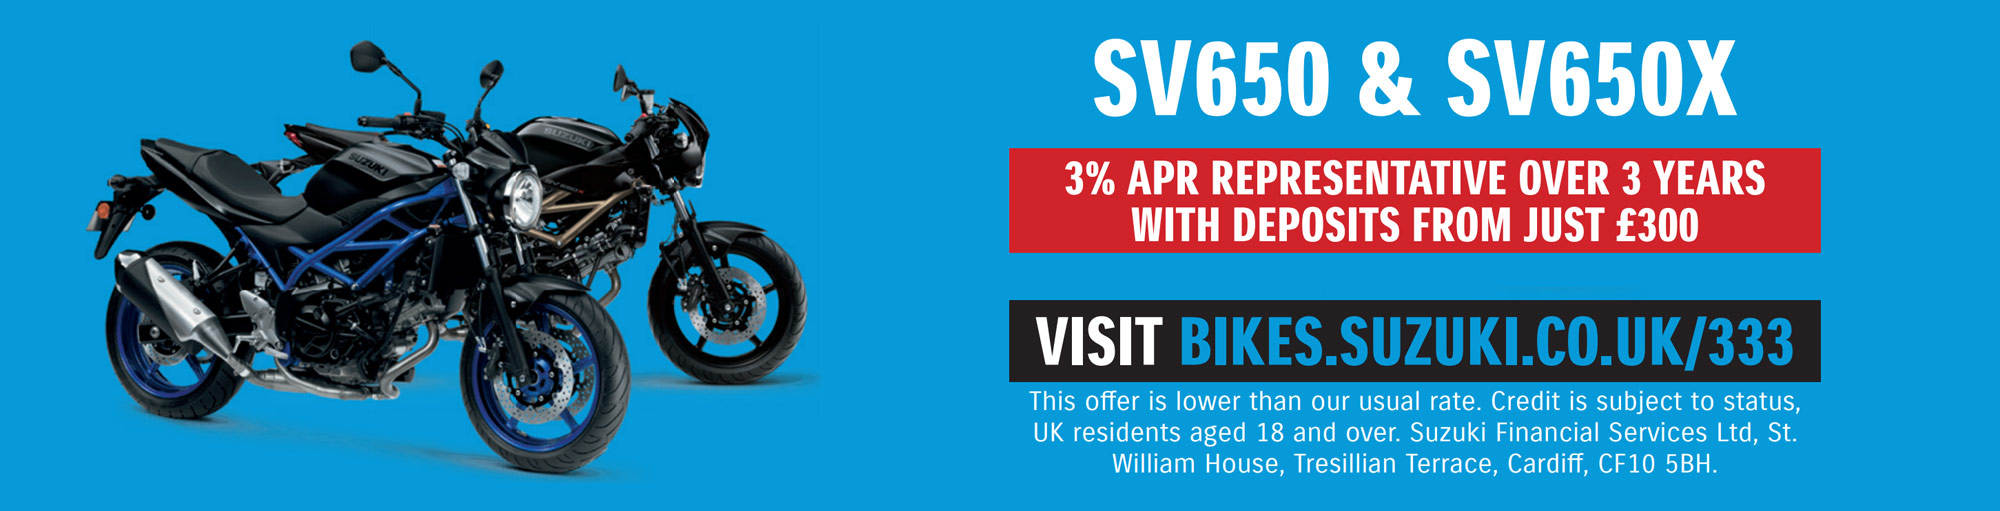 Suzuki SV650 & SV650X 2021 Offer